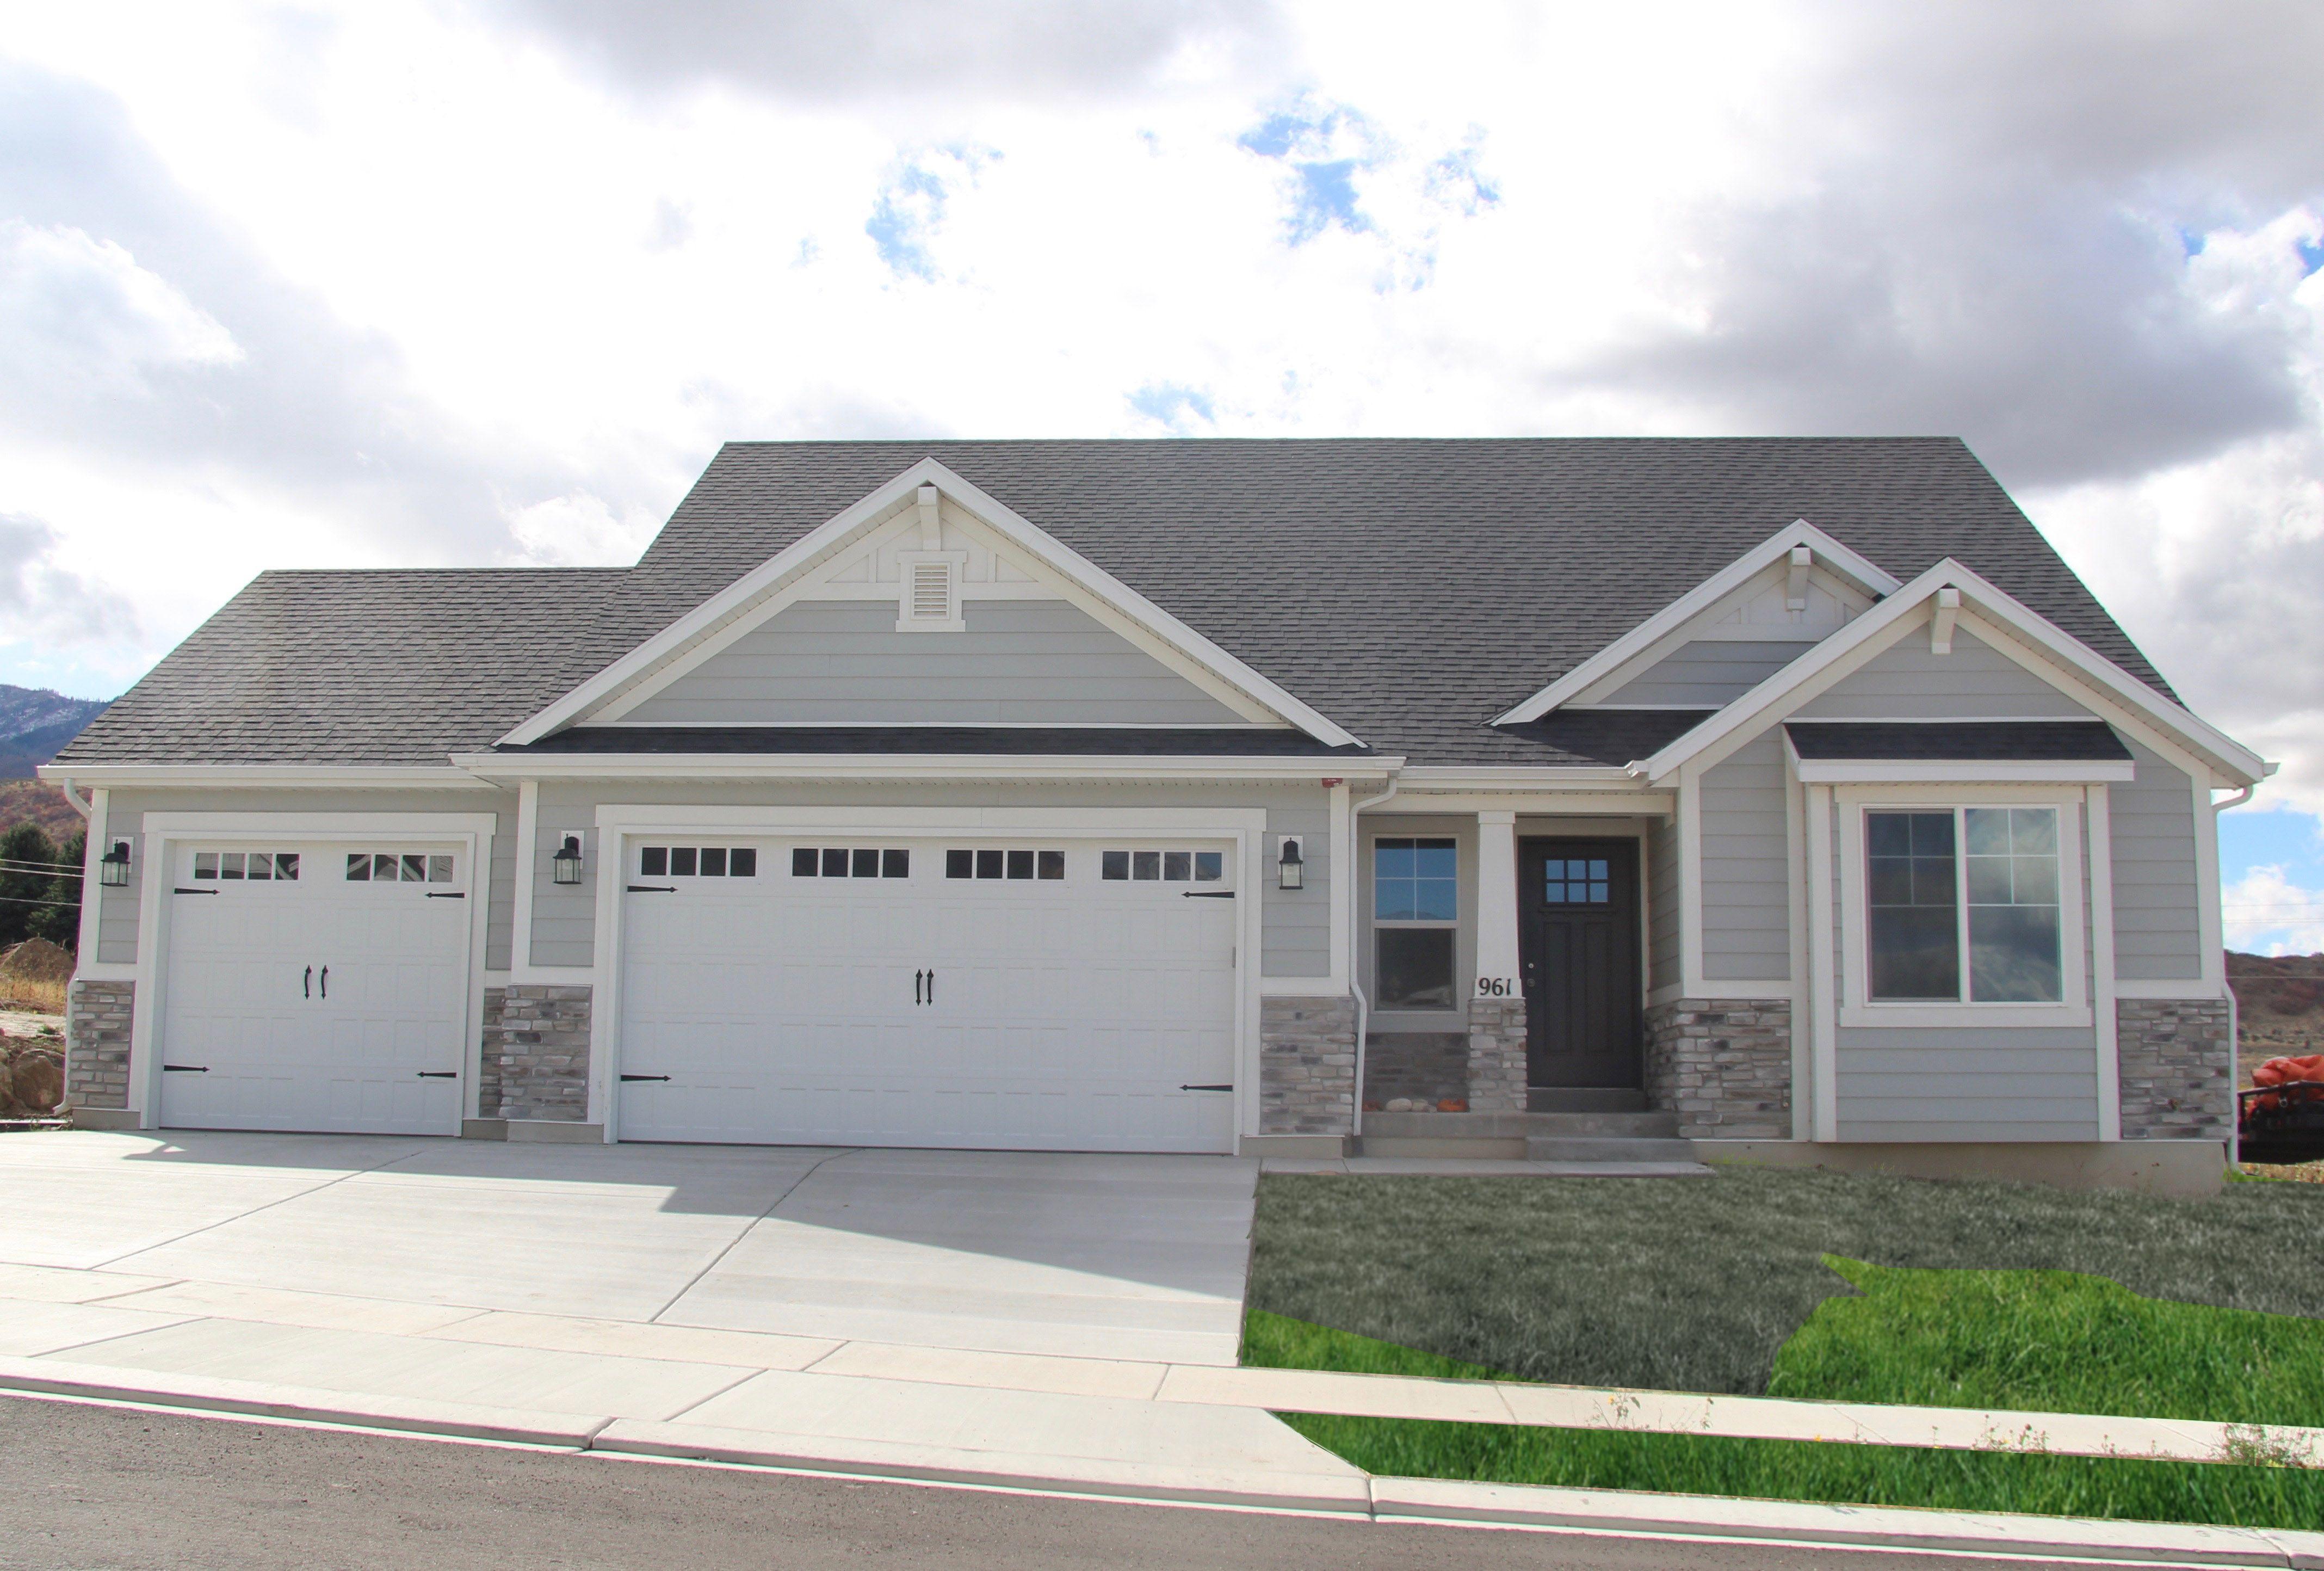 Arive Homes Kayden Bonus Exterior Paint Colors For House House Paint Exterior House Exterior